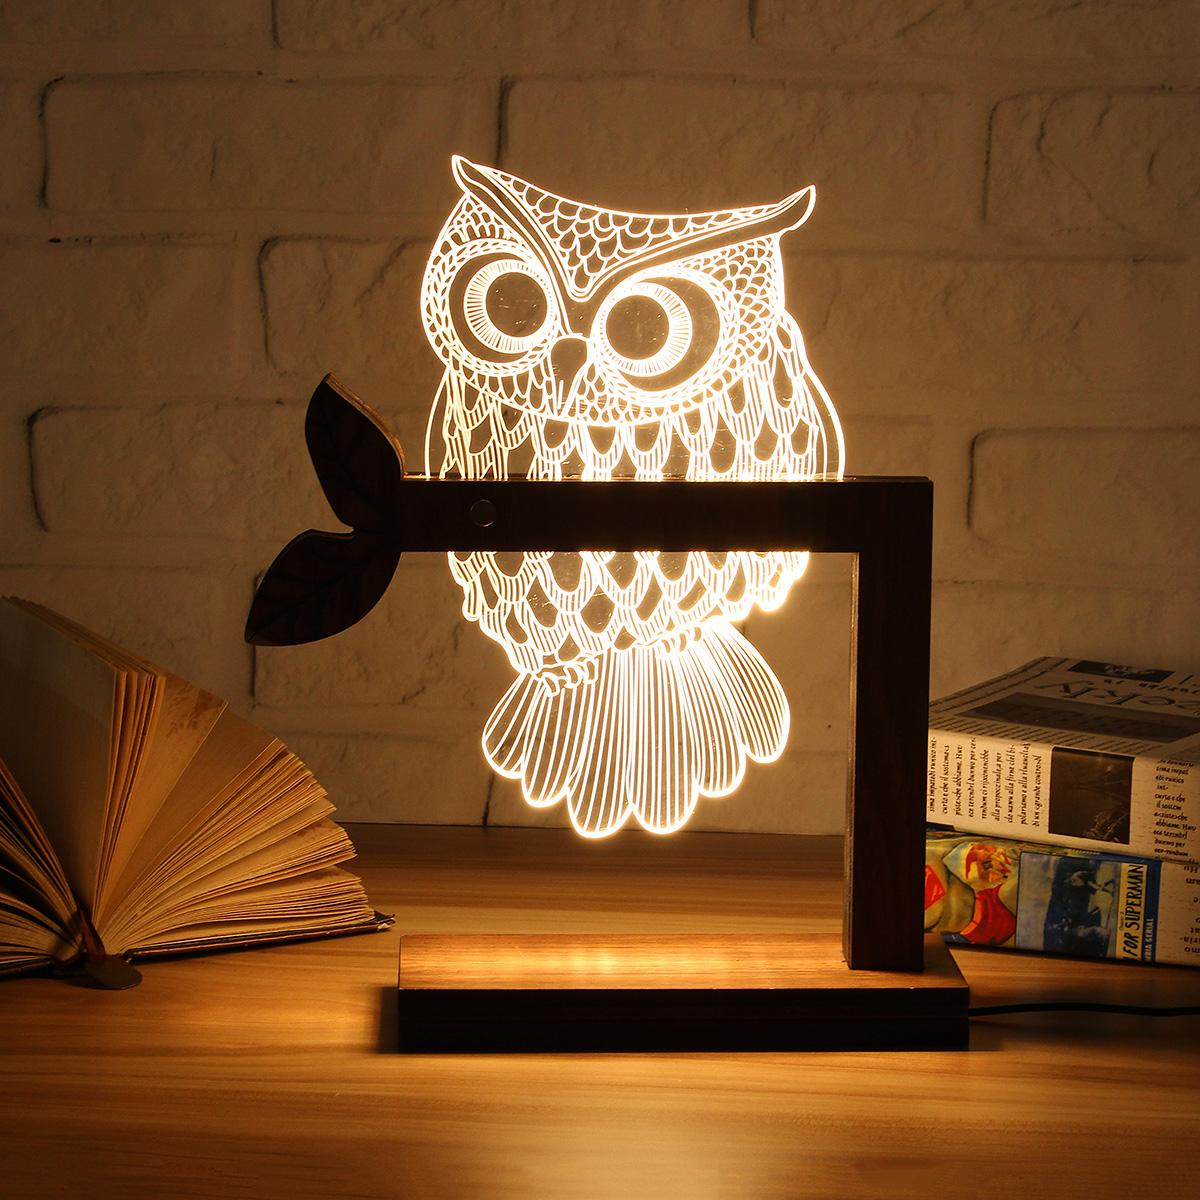 https://i0.wp.com/ae01.alicdn.com/kf/HTB1Gft7ajoIL1JjSZFyq6zFBpXax/Houten-USB-3D-LED-Dier-Vlinder-UIL-Nachtlampje-Warm-Verlichting-Tafel-Leeslampjes-Slaapkamer-Interieur-Verjaardagscadeau.jpg